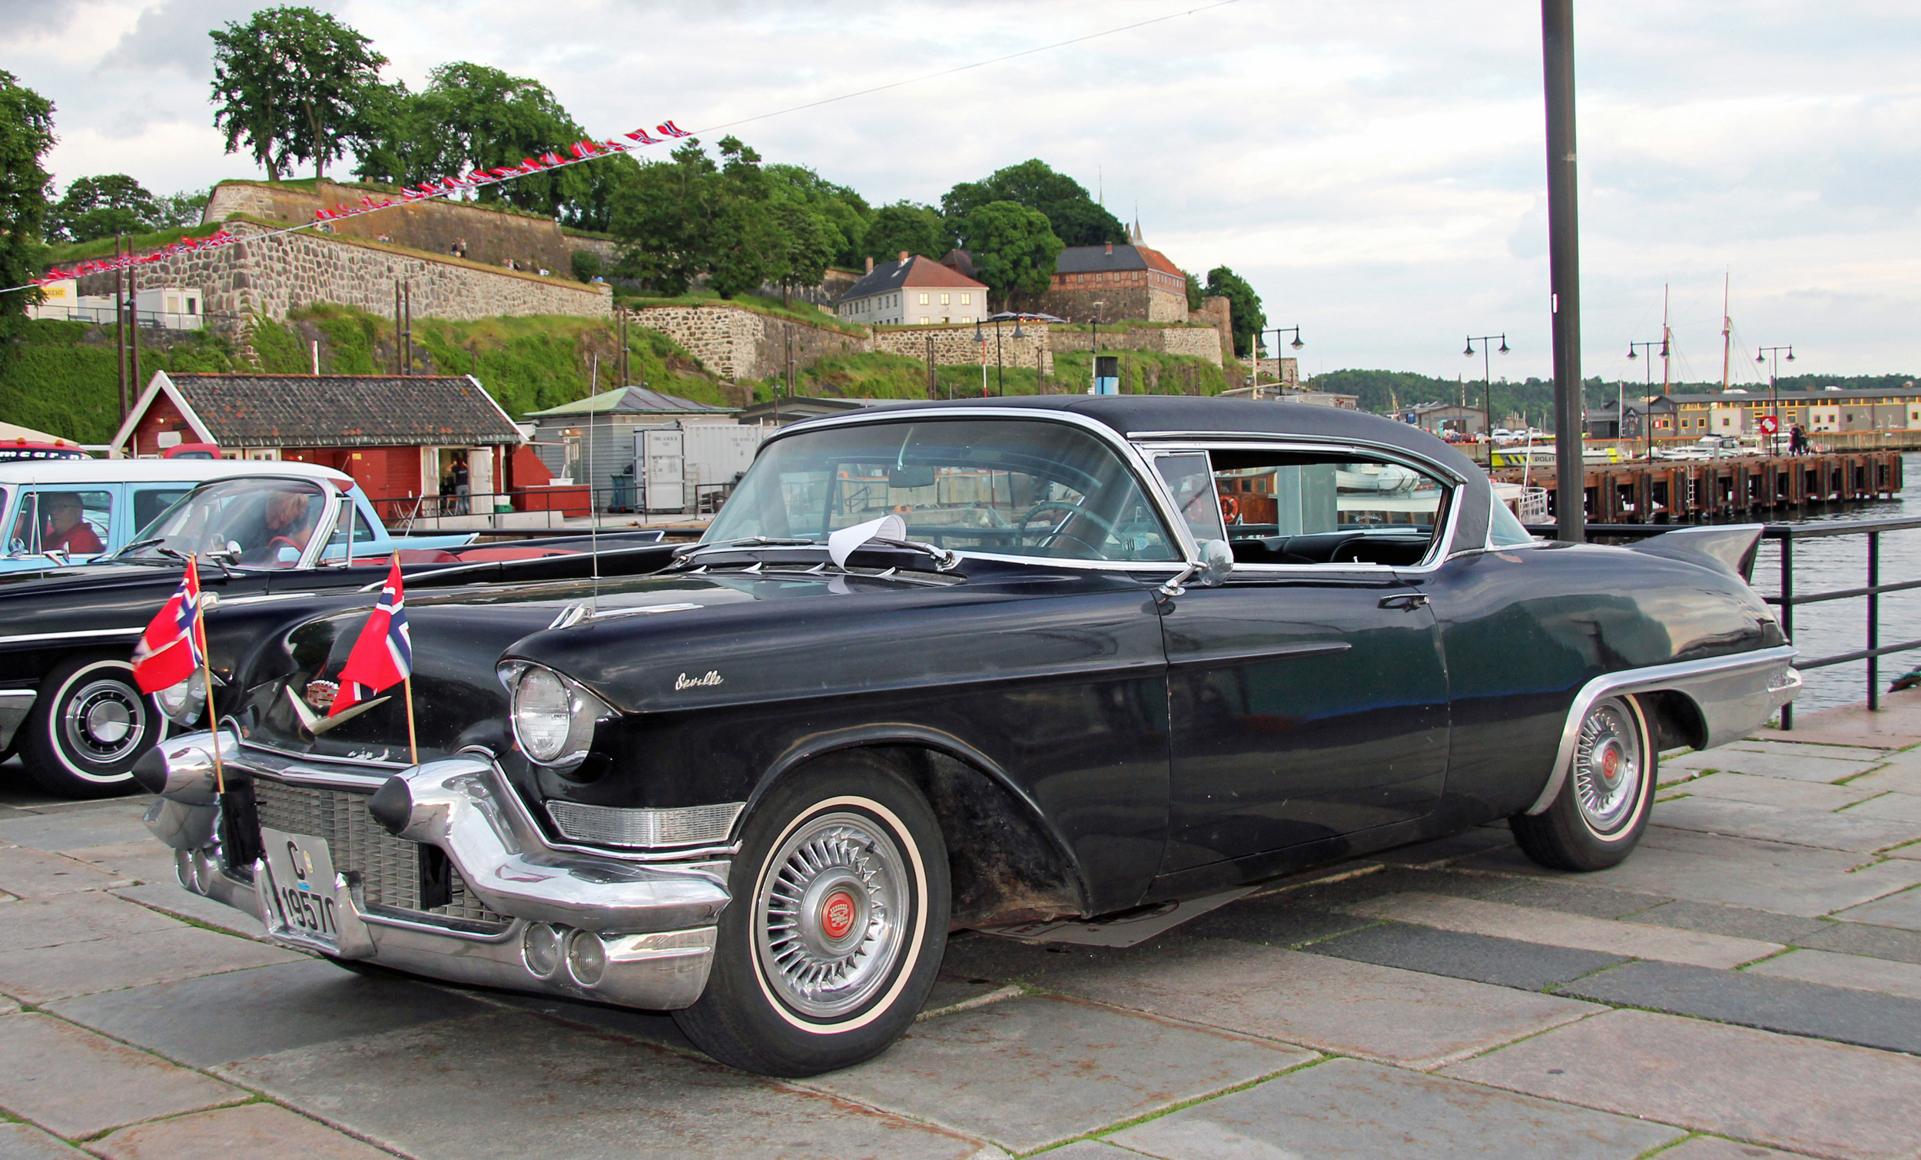 017-1957 Cadillac Eldordao Seville 01. Eier- medle